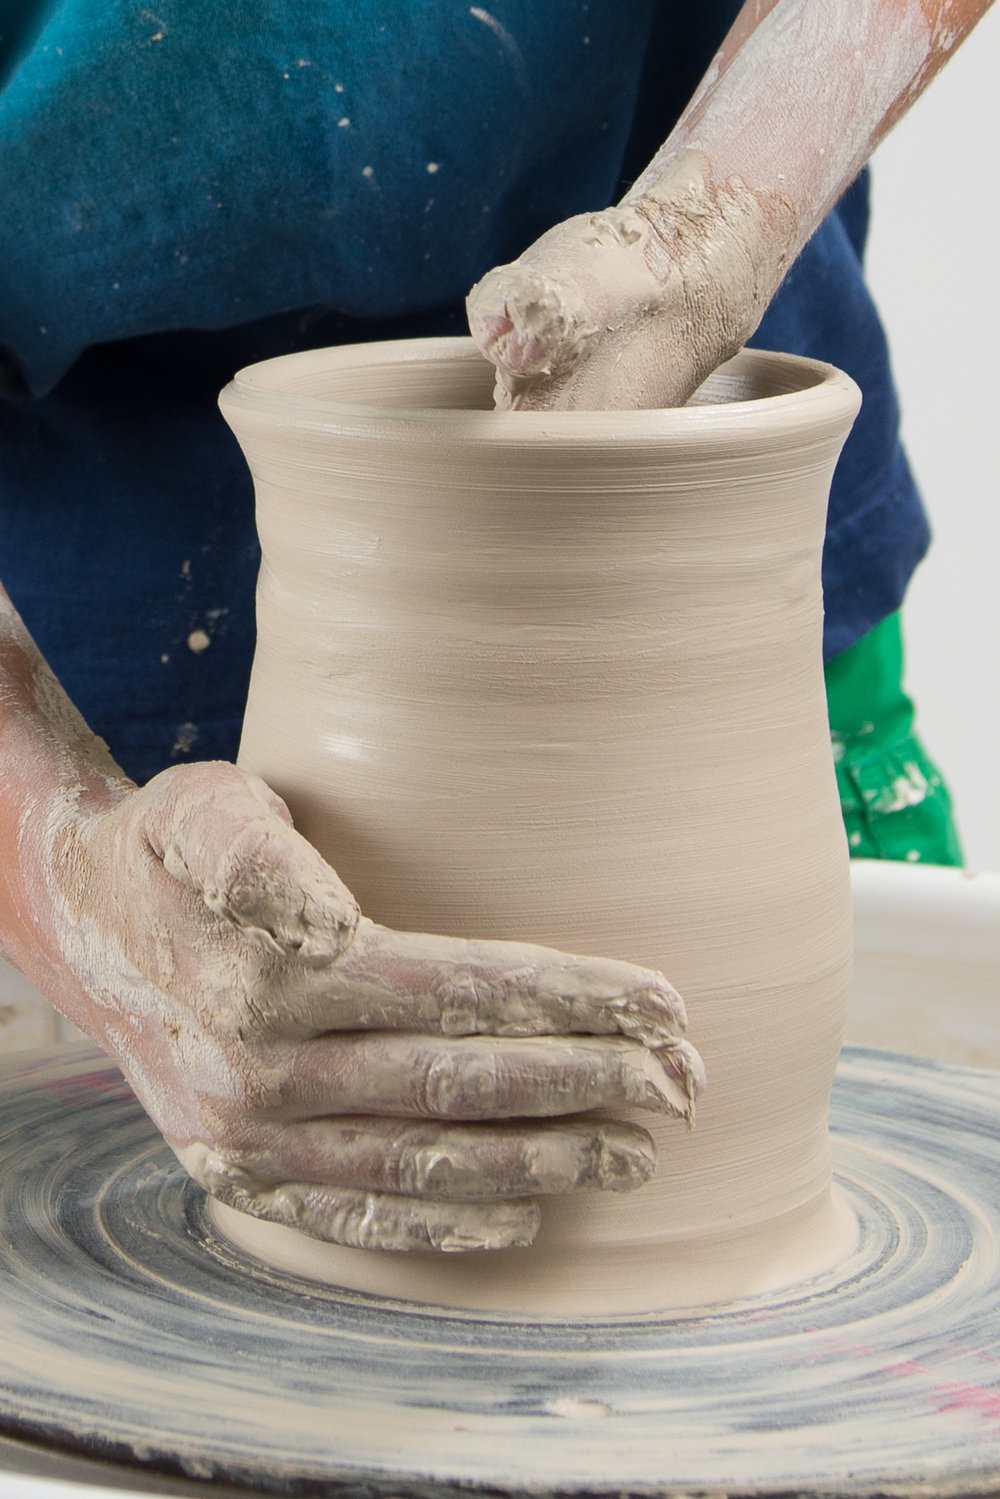 Kids Pottery, clay, pressure, spinning, glaze, firing-58.jpg